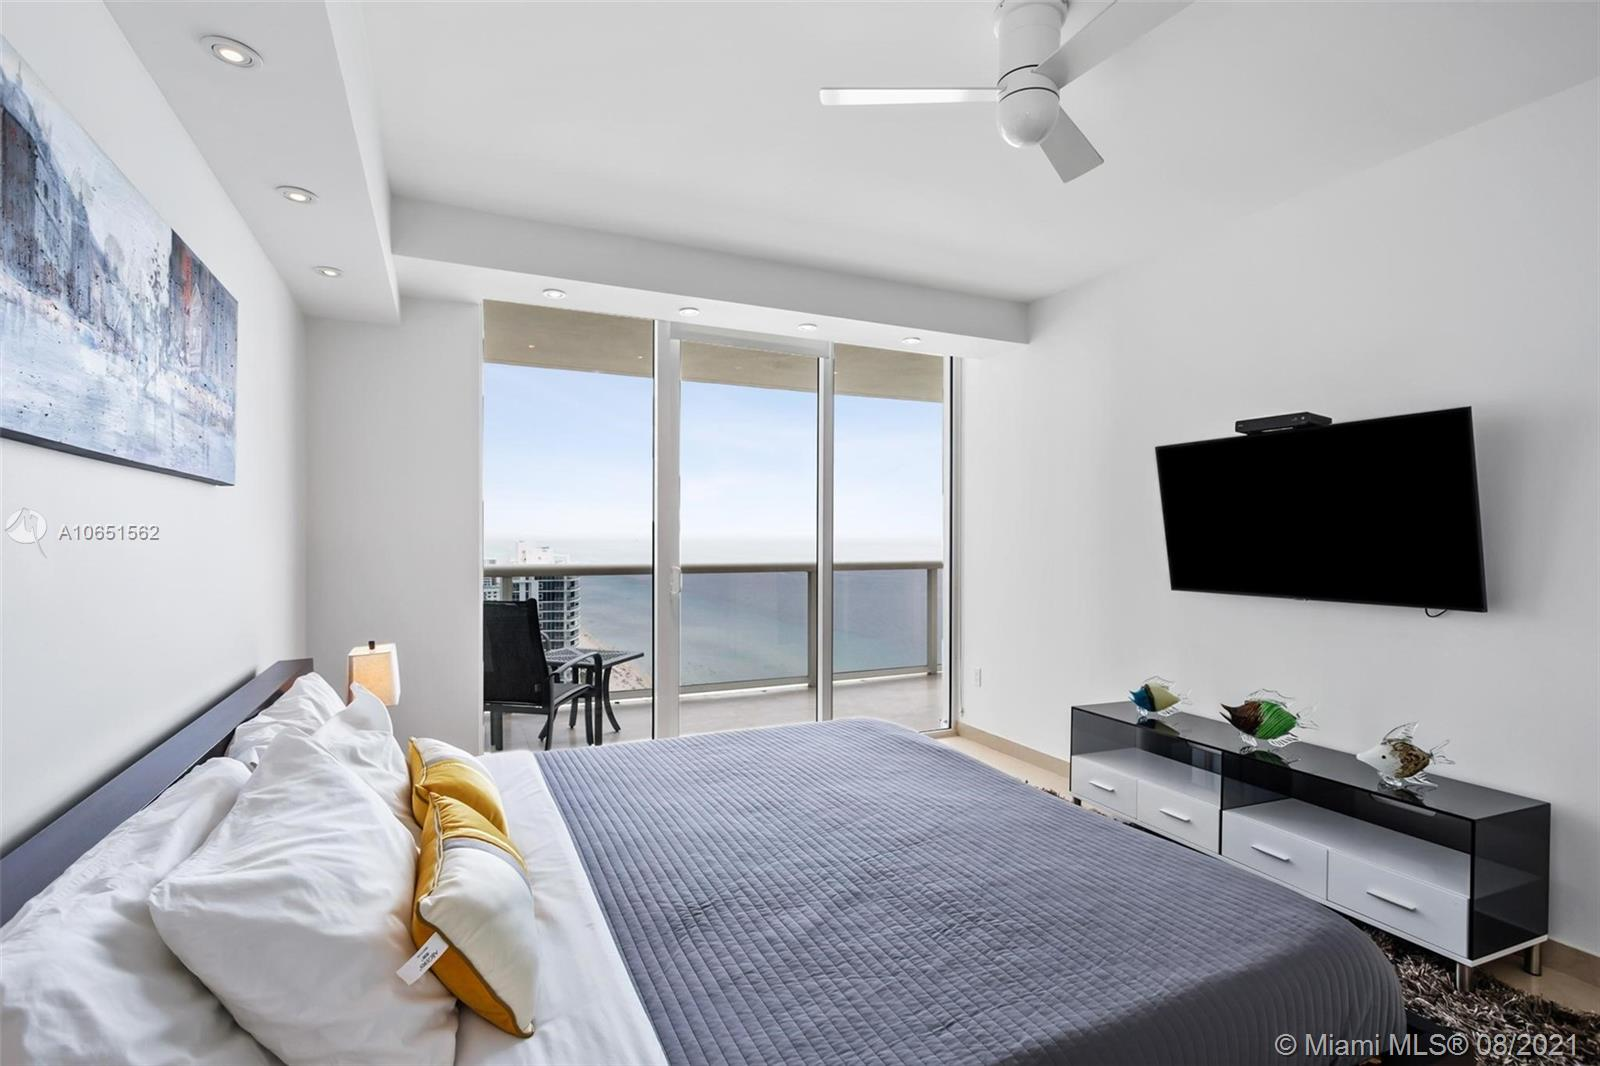 3011 3 / 2 1554 sq. ft. $ 2020-09-25 0 Photo